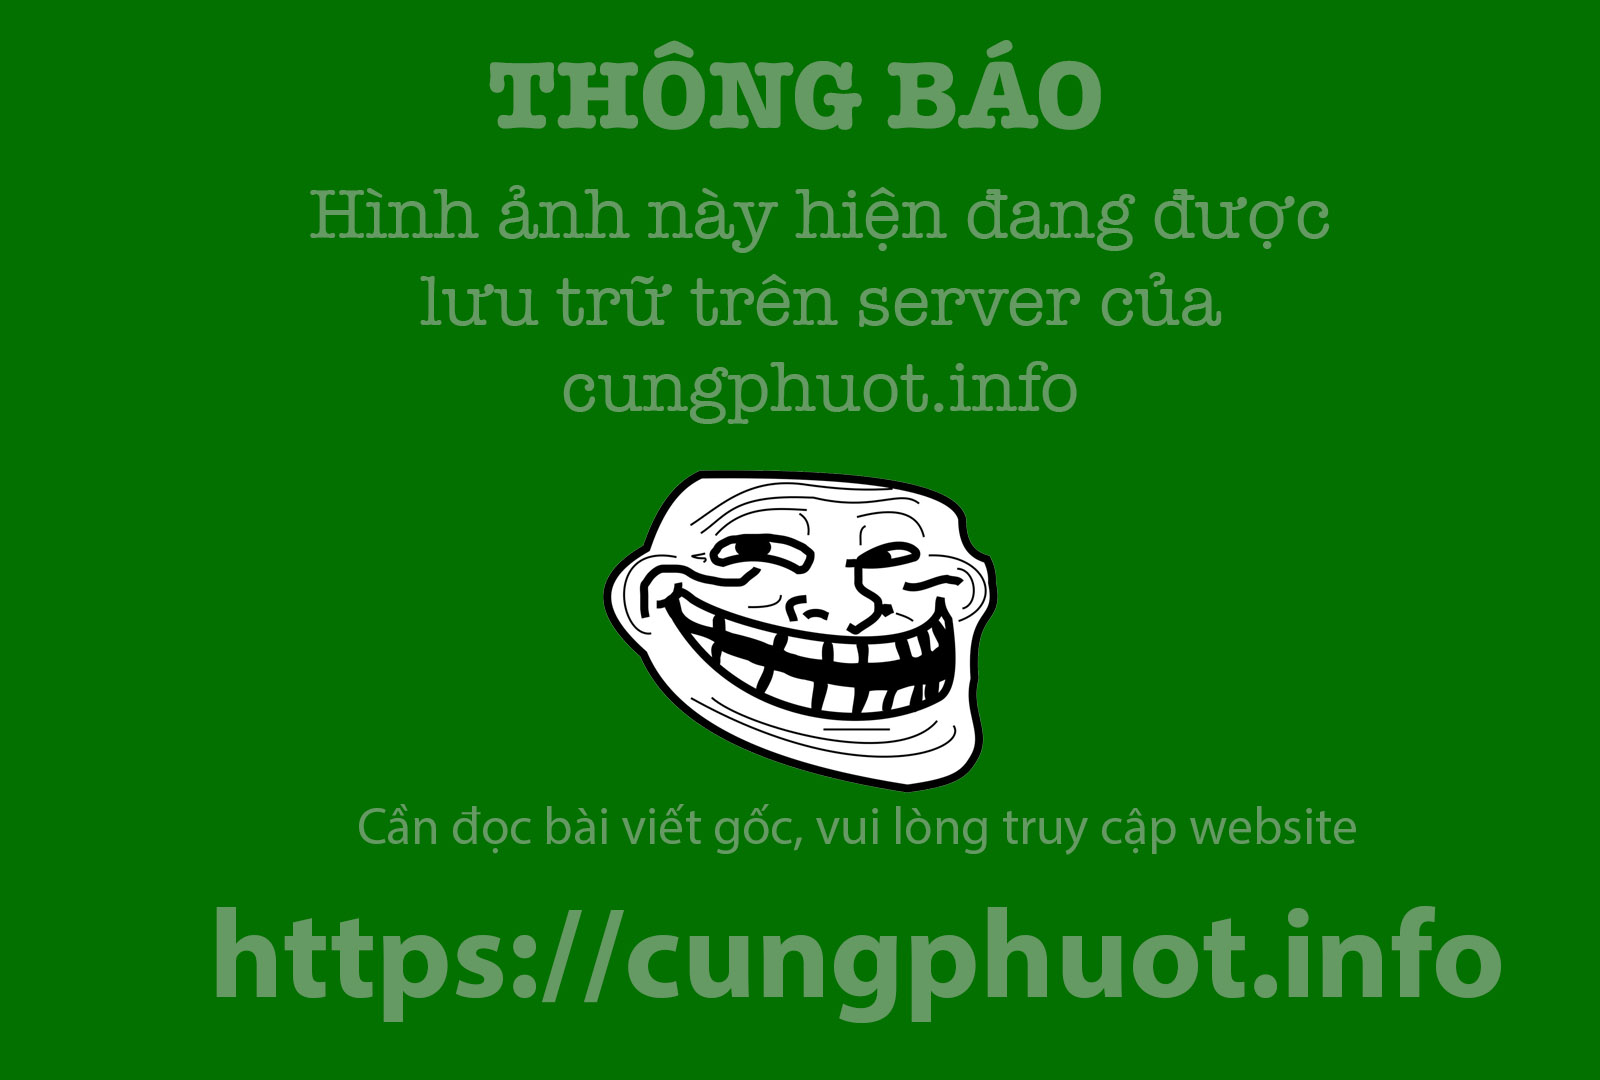 Dan phuot me man ve dep ky vi cua hang Prai o Quang Tri hinh anh 6